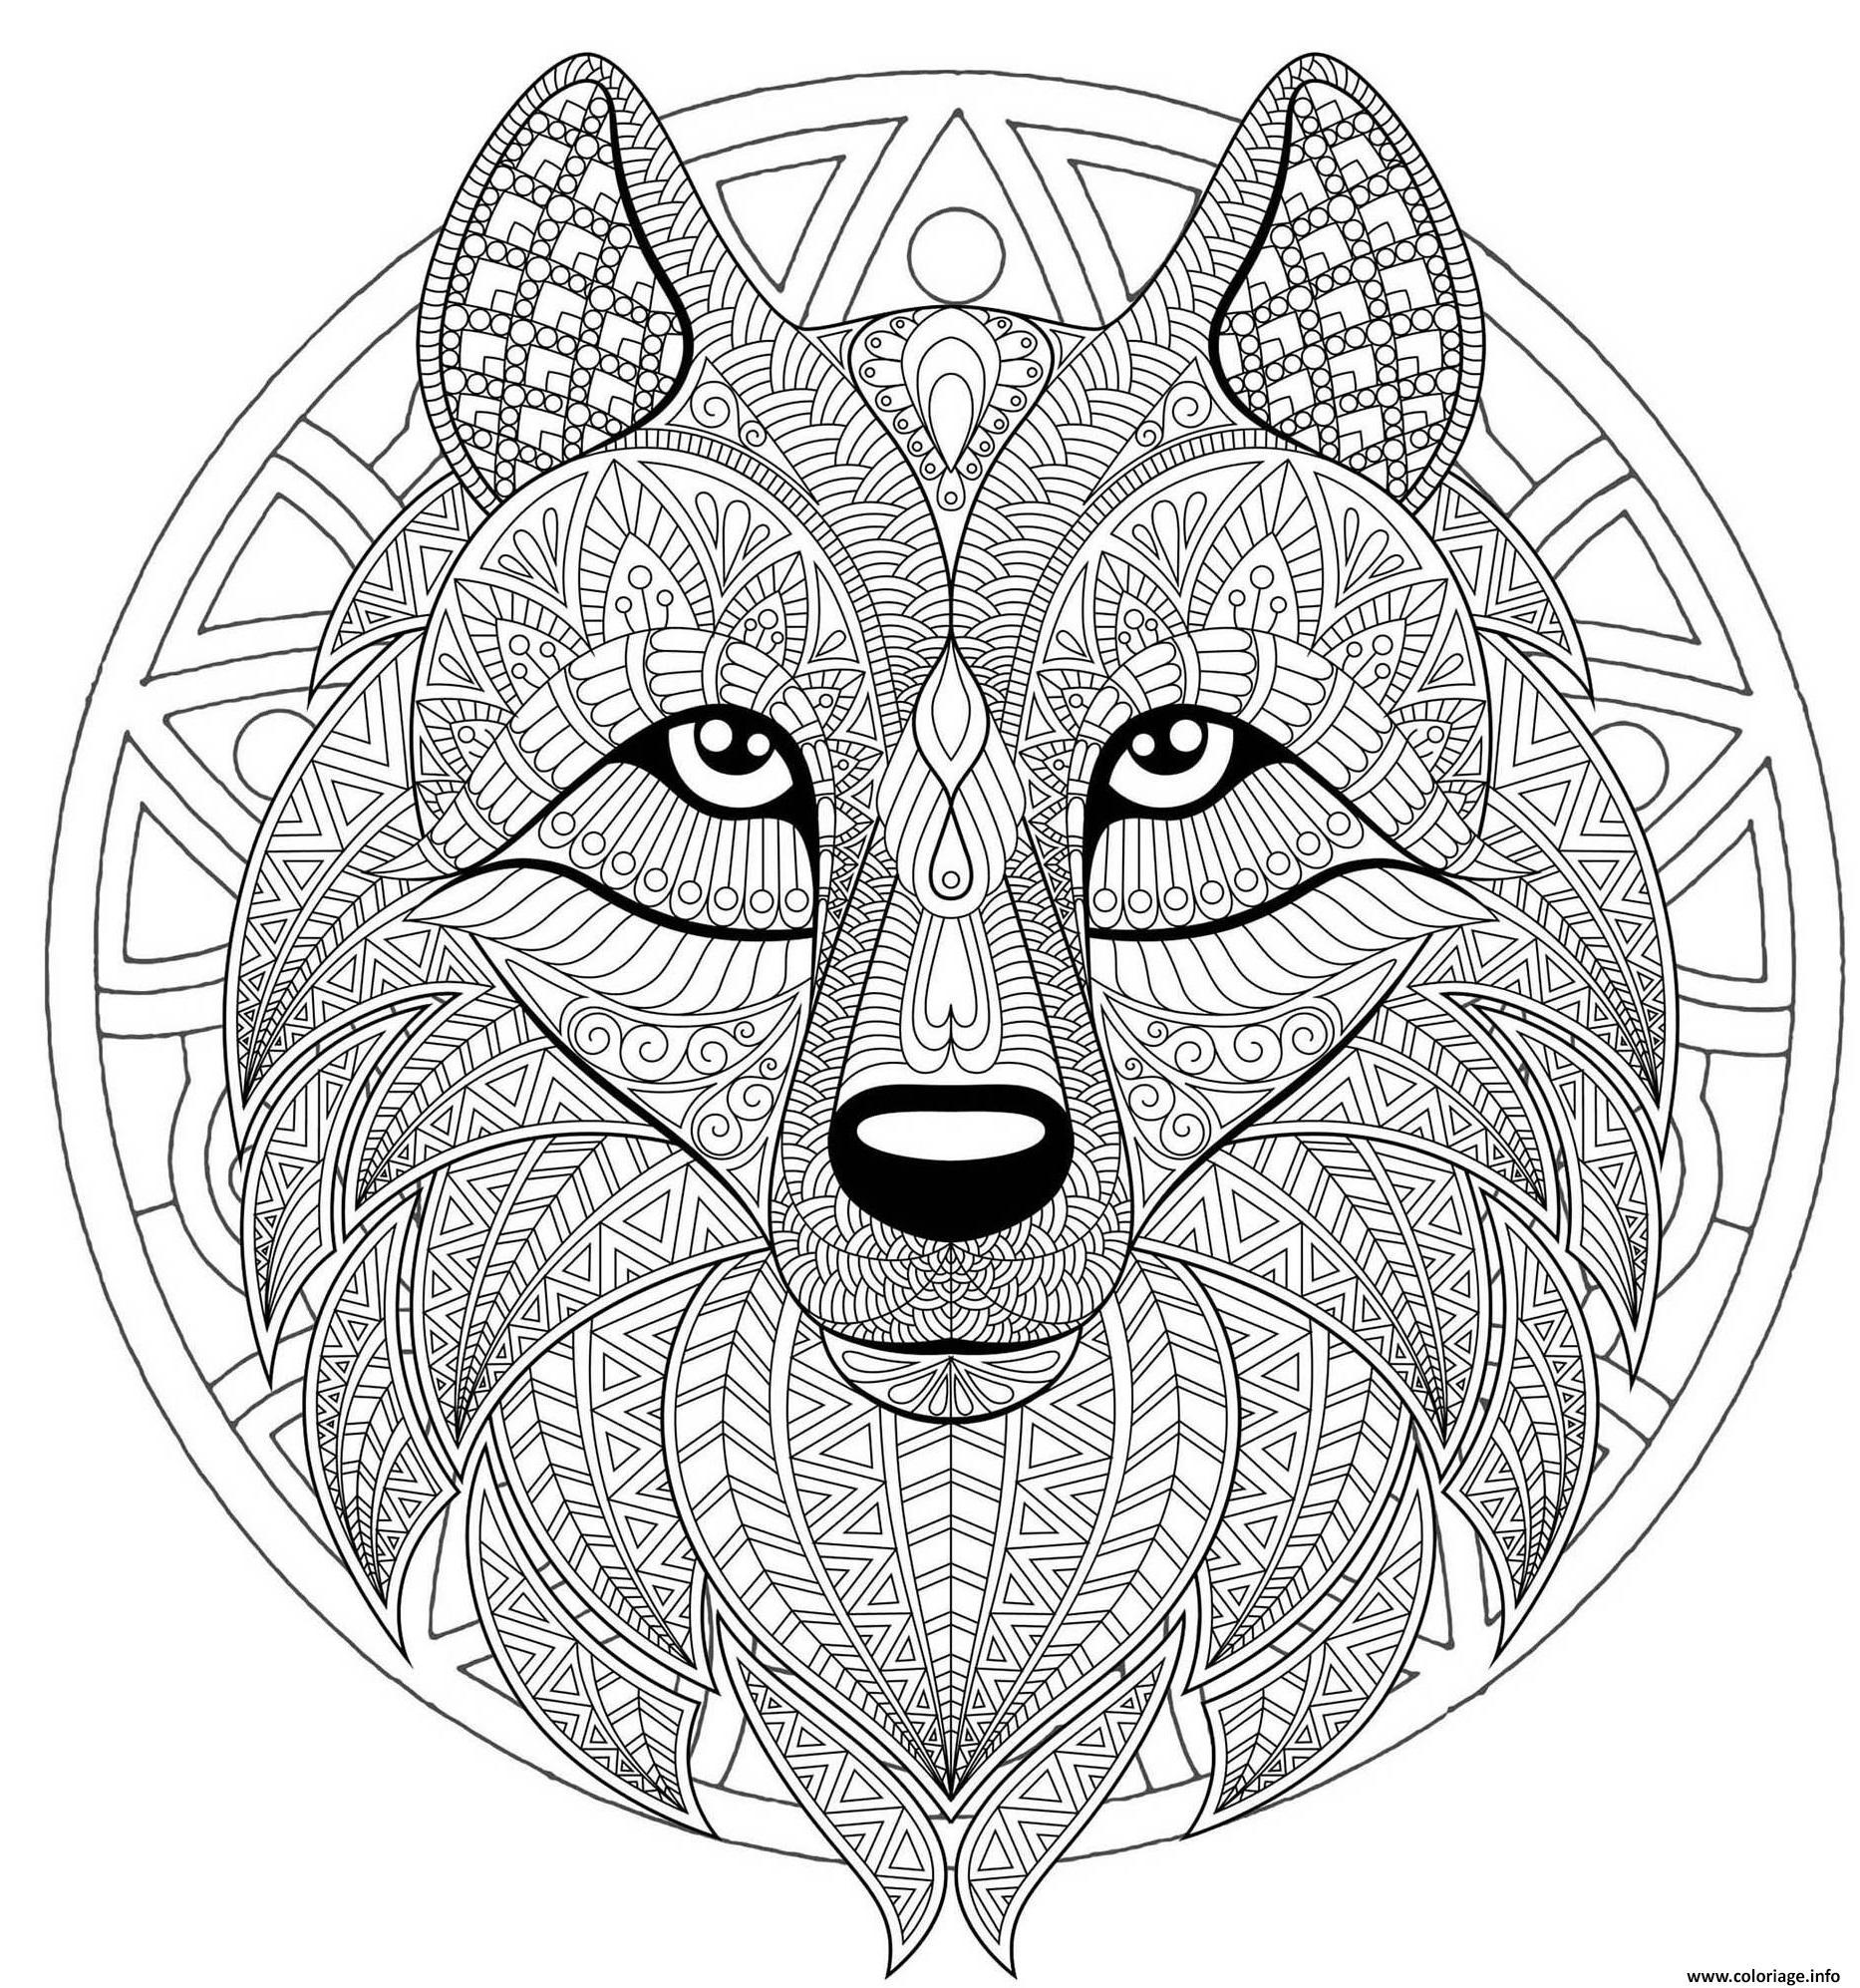 Coloriage Mandala Loup Difficile Complexe Beau Loup Dessin